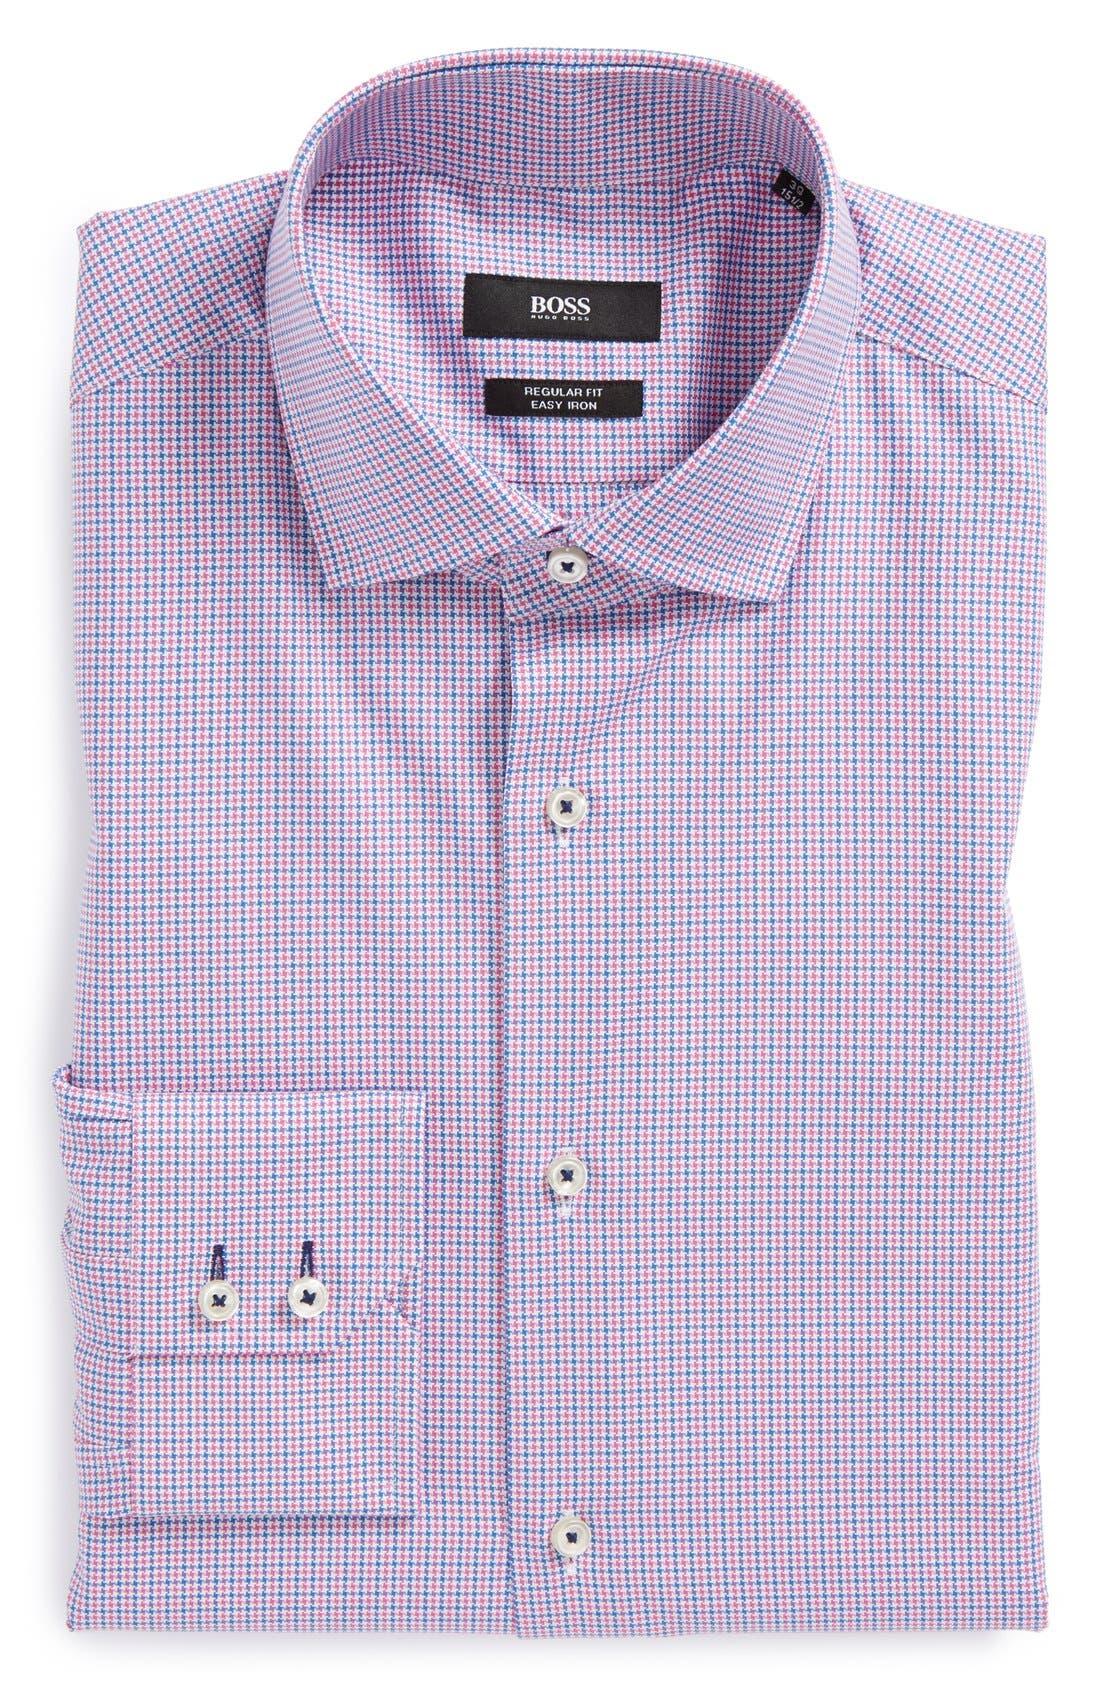 Alternate Image 1 Selected - BOSS HUGO BOSS 'Gorman' Easy Iron WW Regular Fit Houndstooth Dress Shirt